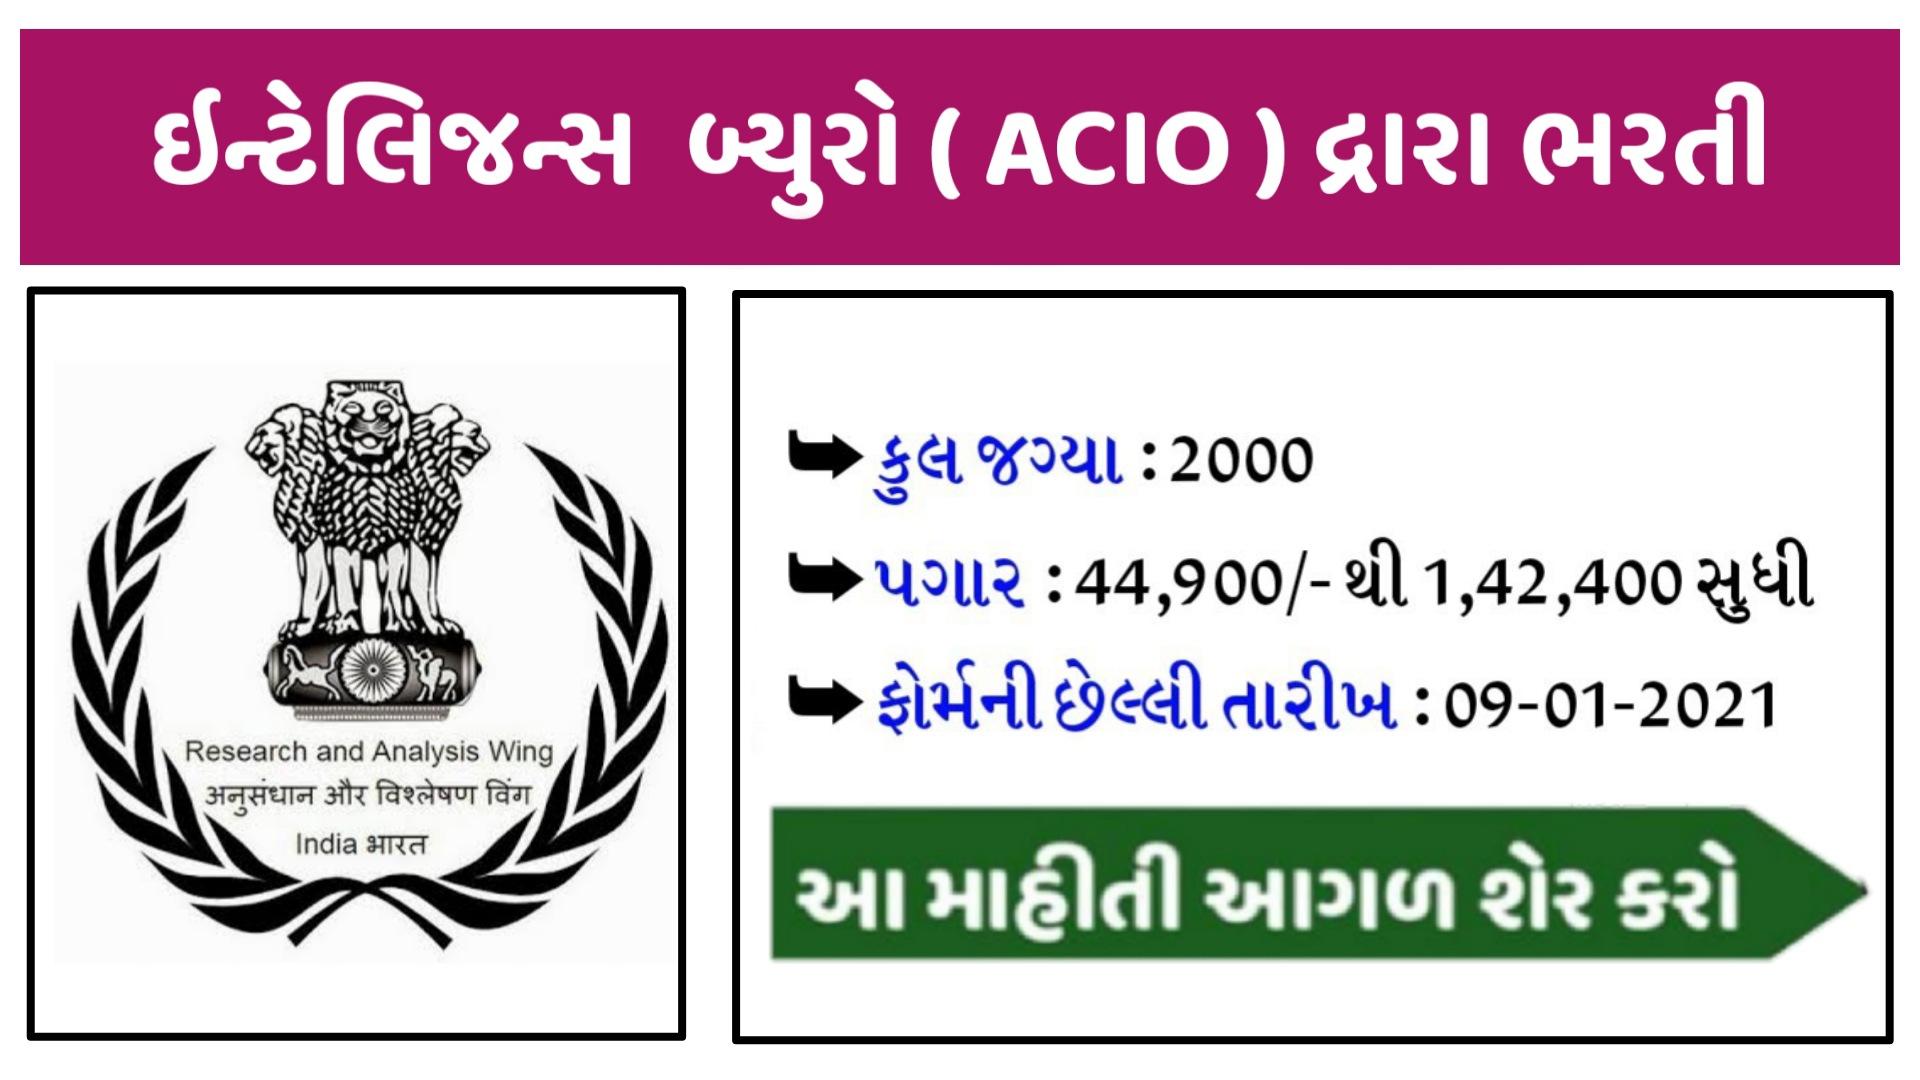 Ib Acio Application Form 2020-21 Apply Online